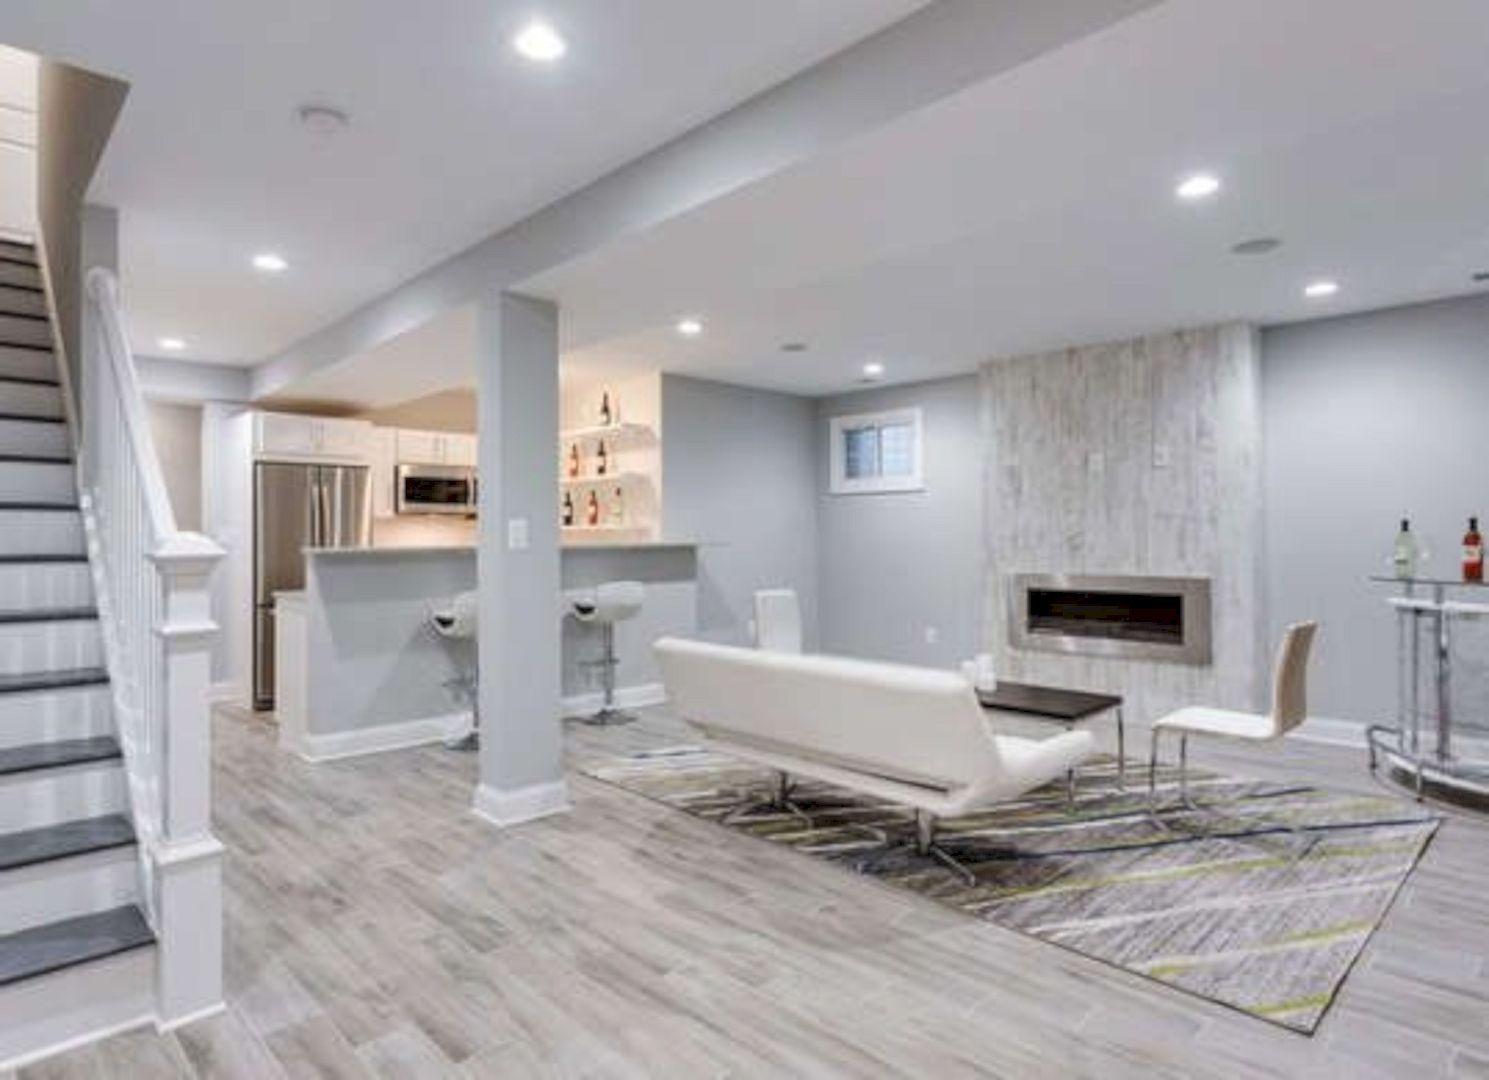 Basement Renovation Ideas For Small Basements Creative 16 creative renovation ideas to enhance your basement | basement